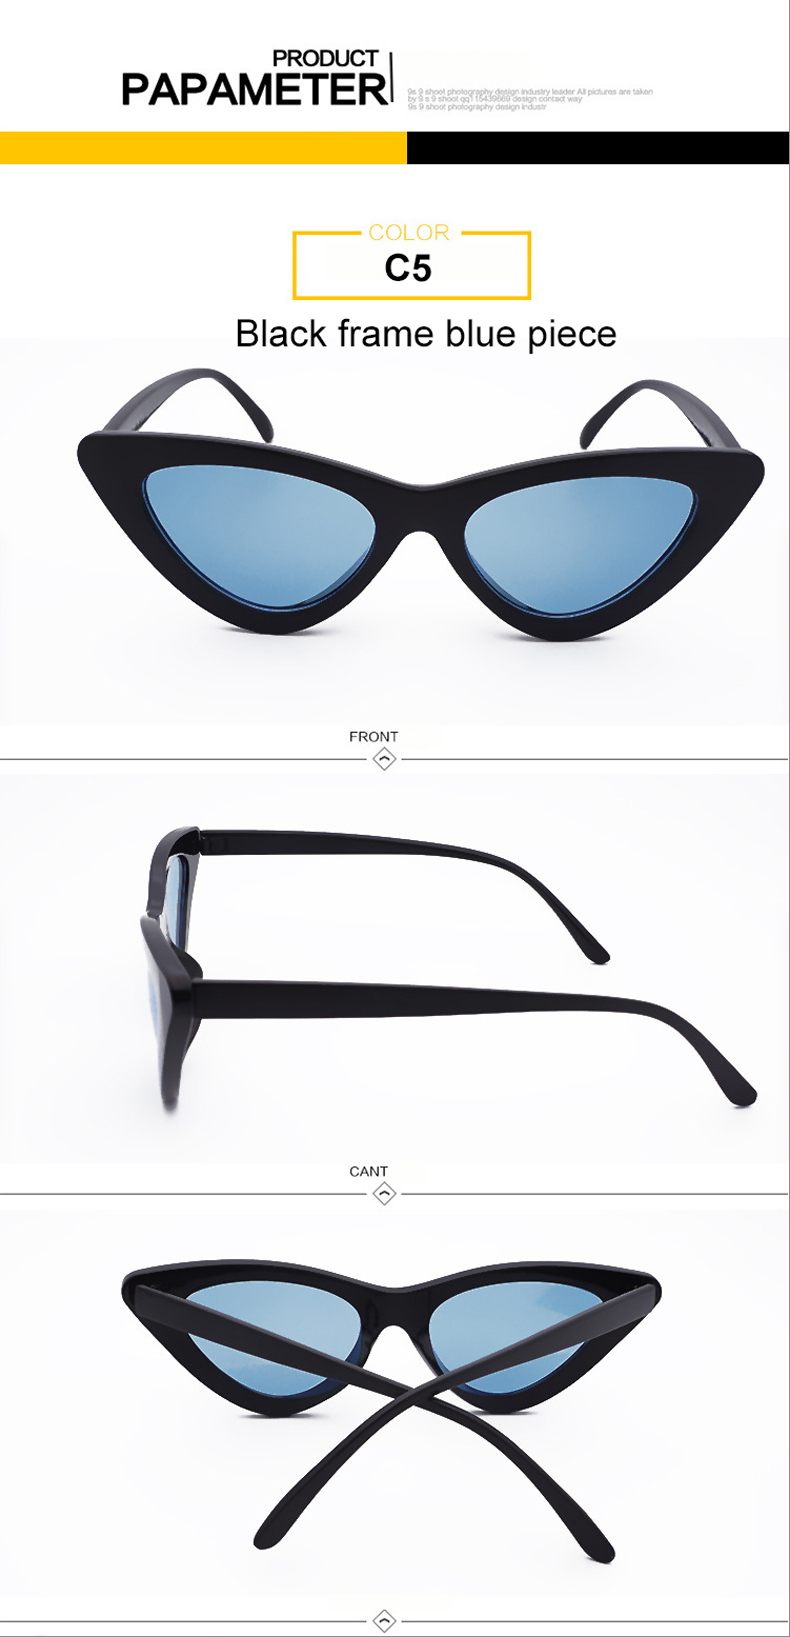 HTB1PowBnrsTMeJjSszhq6AGCFXa7 - WHO CUTIE 2018 Brand Designer Black Cat Eye Sunglasses Women Cool Small Cateye Frame Sun Glasses Fashion UV400 Shades WG-008